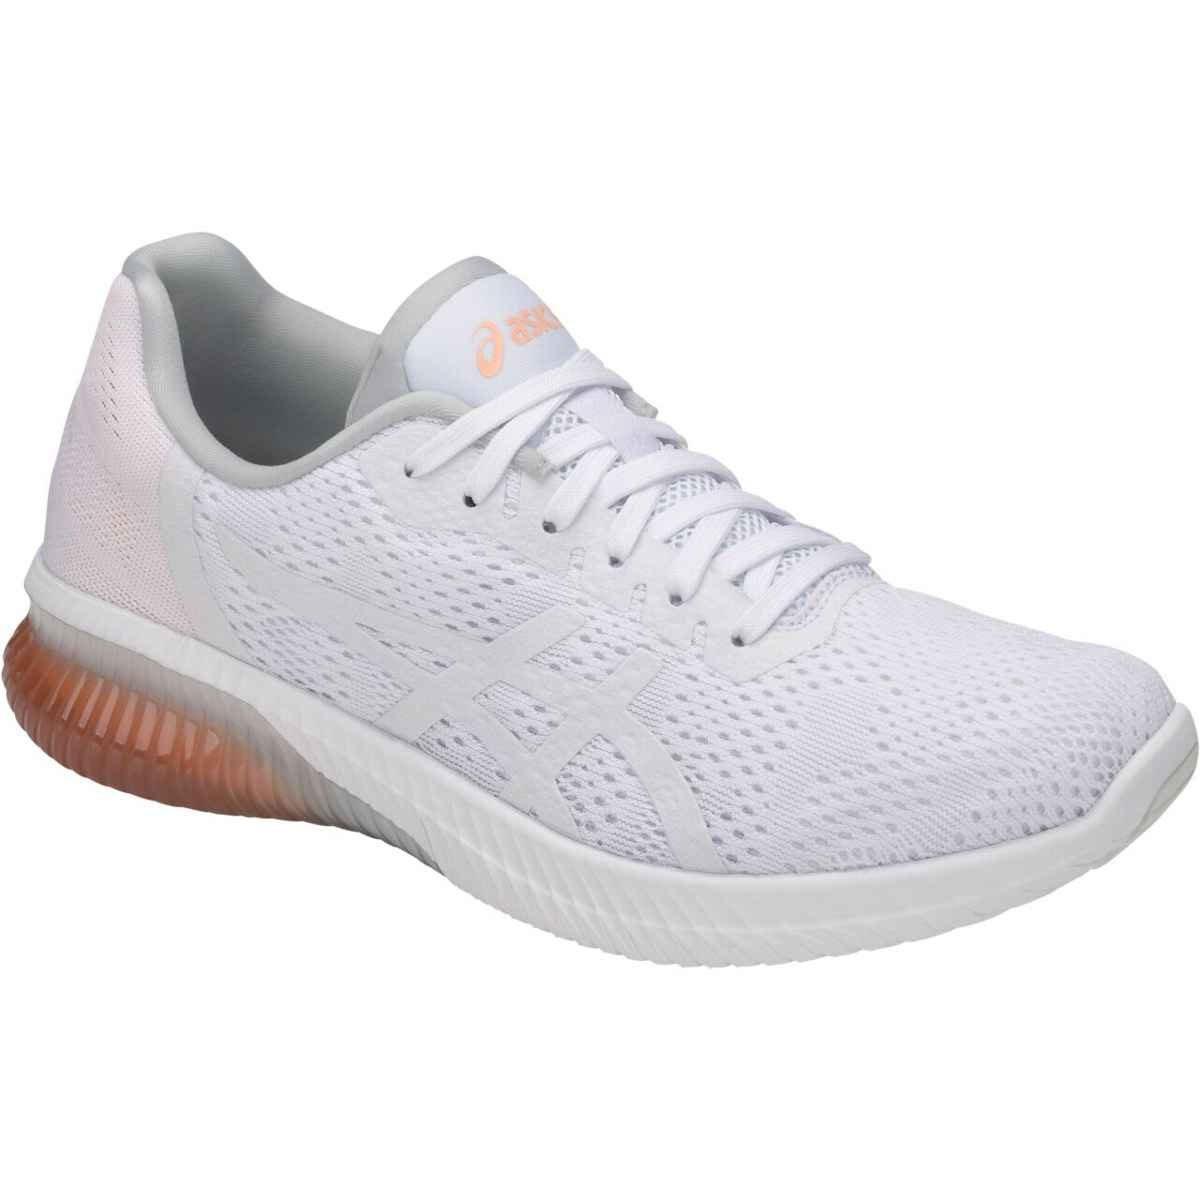 ASICS T888N Women's Gel-Kenun MX Running Shoe B075PGRB3N 9.5 B(M) US|White/White/Apricot Ice